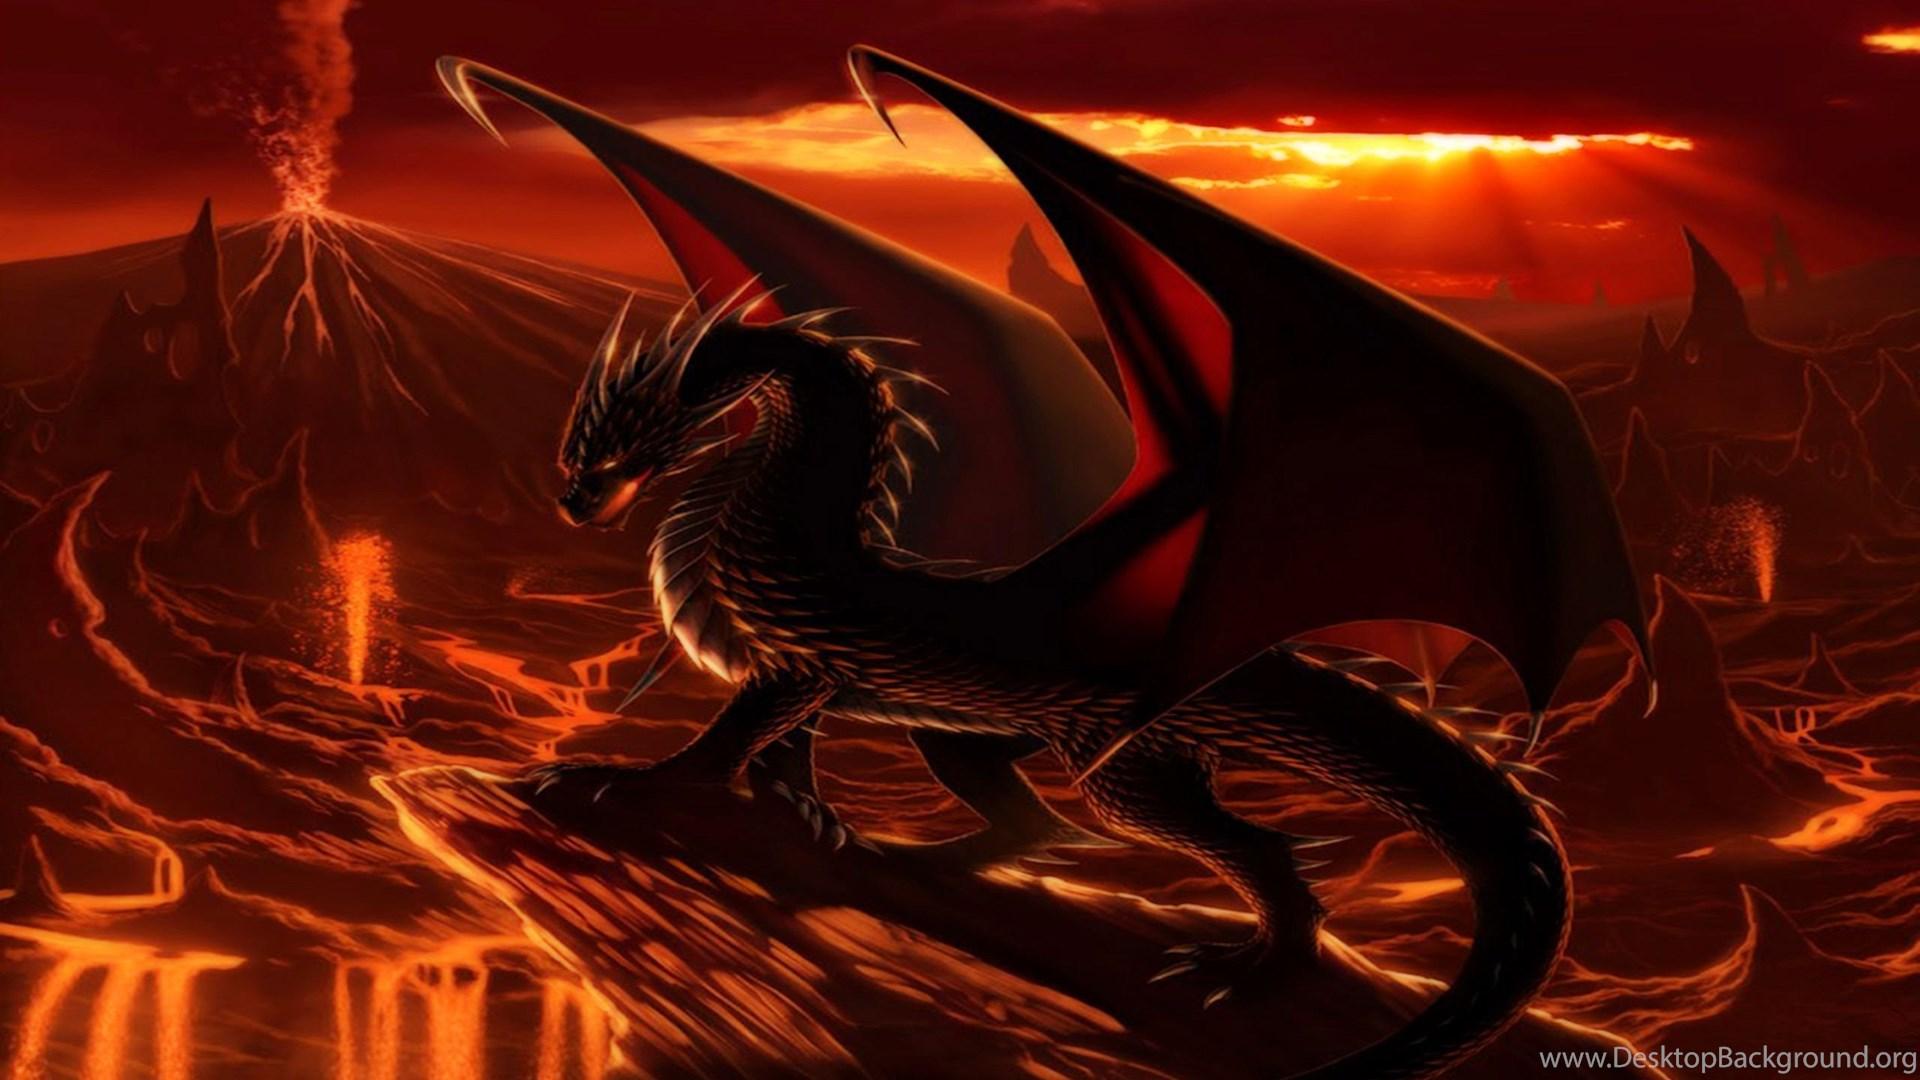 Fire Dragon Wallpapers 72913 Desktop Background